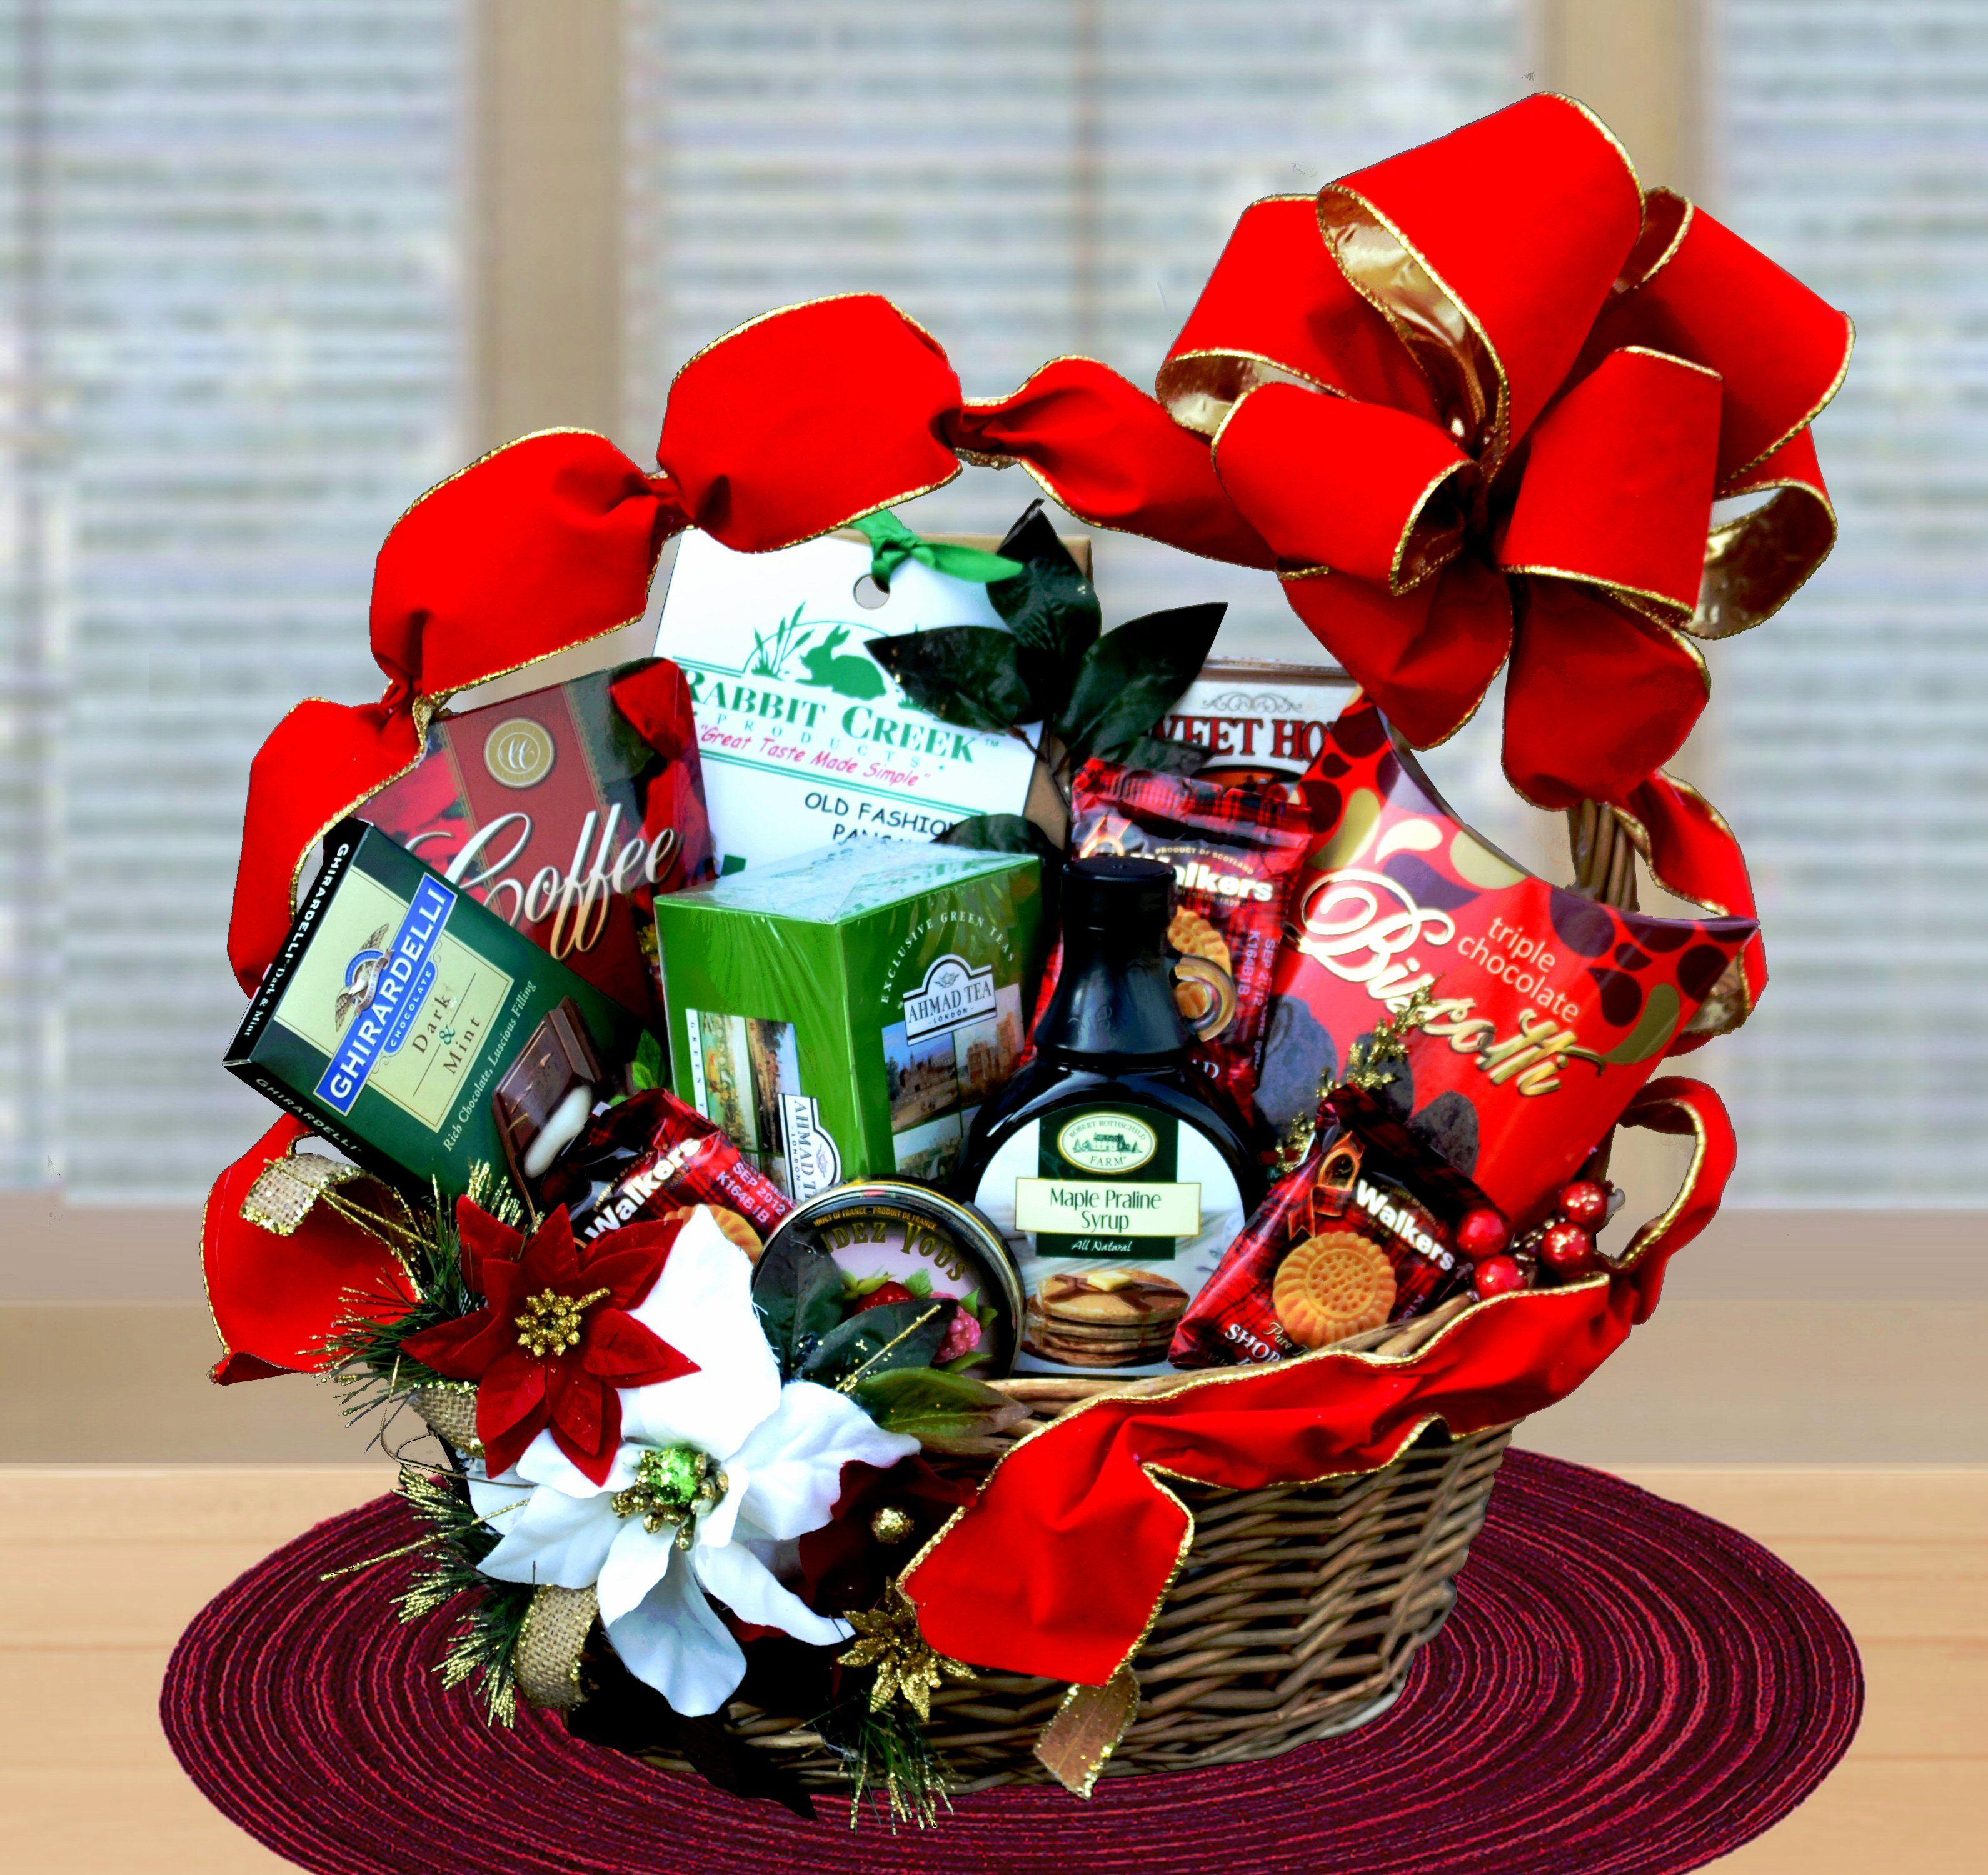 Seasons Greetings From Elegant Gifts Christmas Baskets Holiday Gift Baskets Christmas Gift Baskets Holiday Christmas Gifts